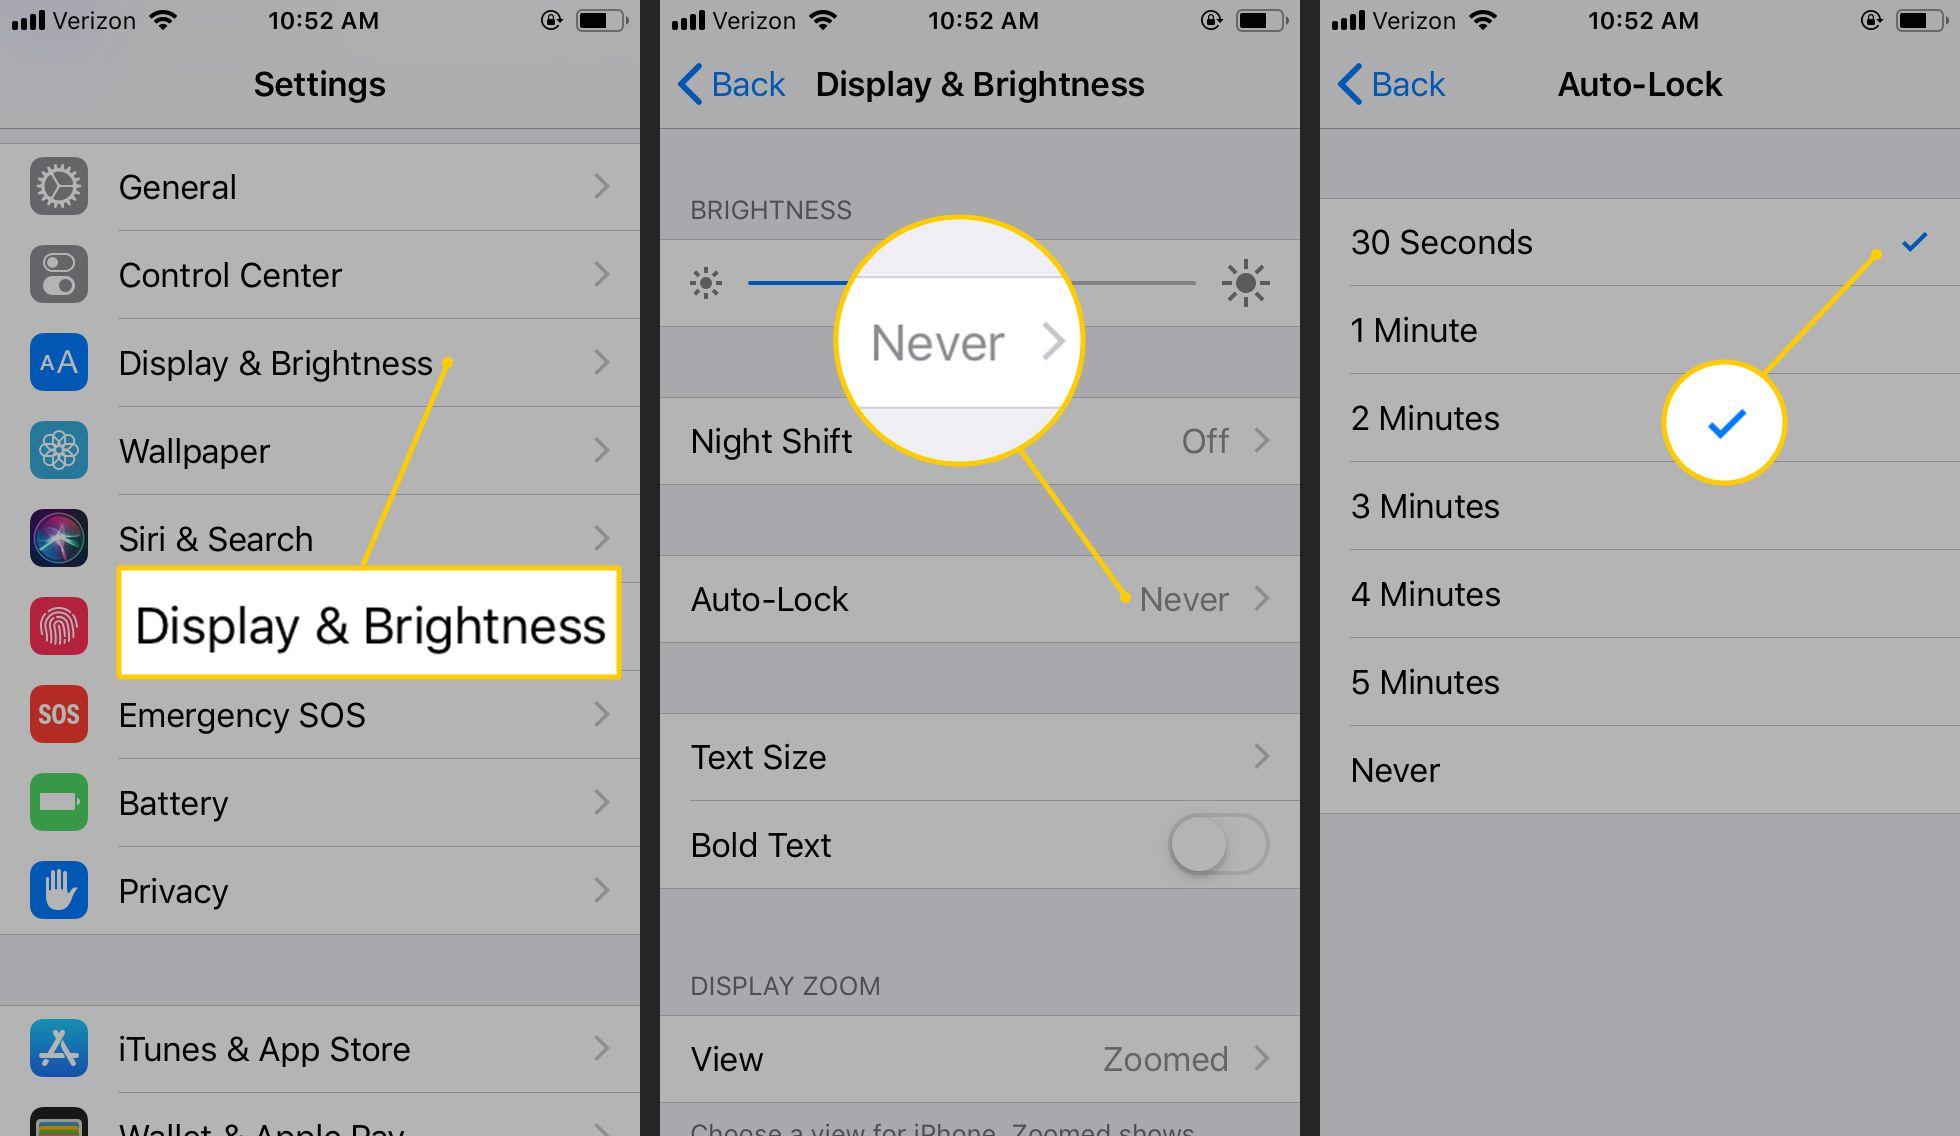 Display & Brightness, Auto-Lock, 30 Seconds